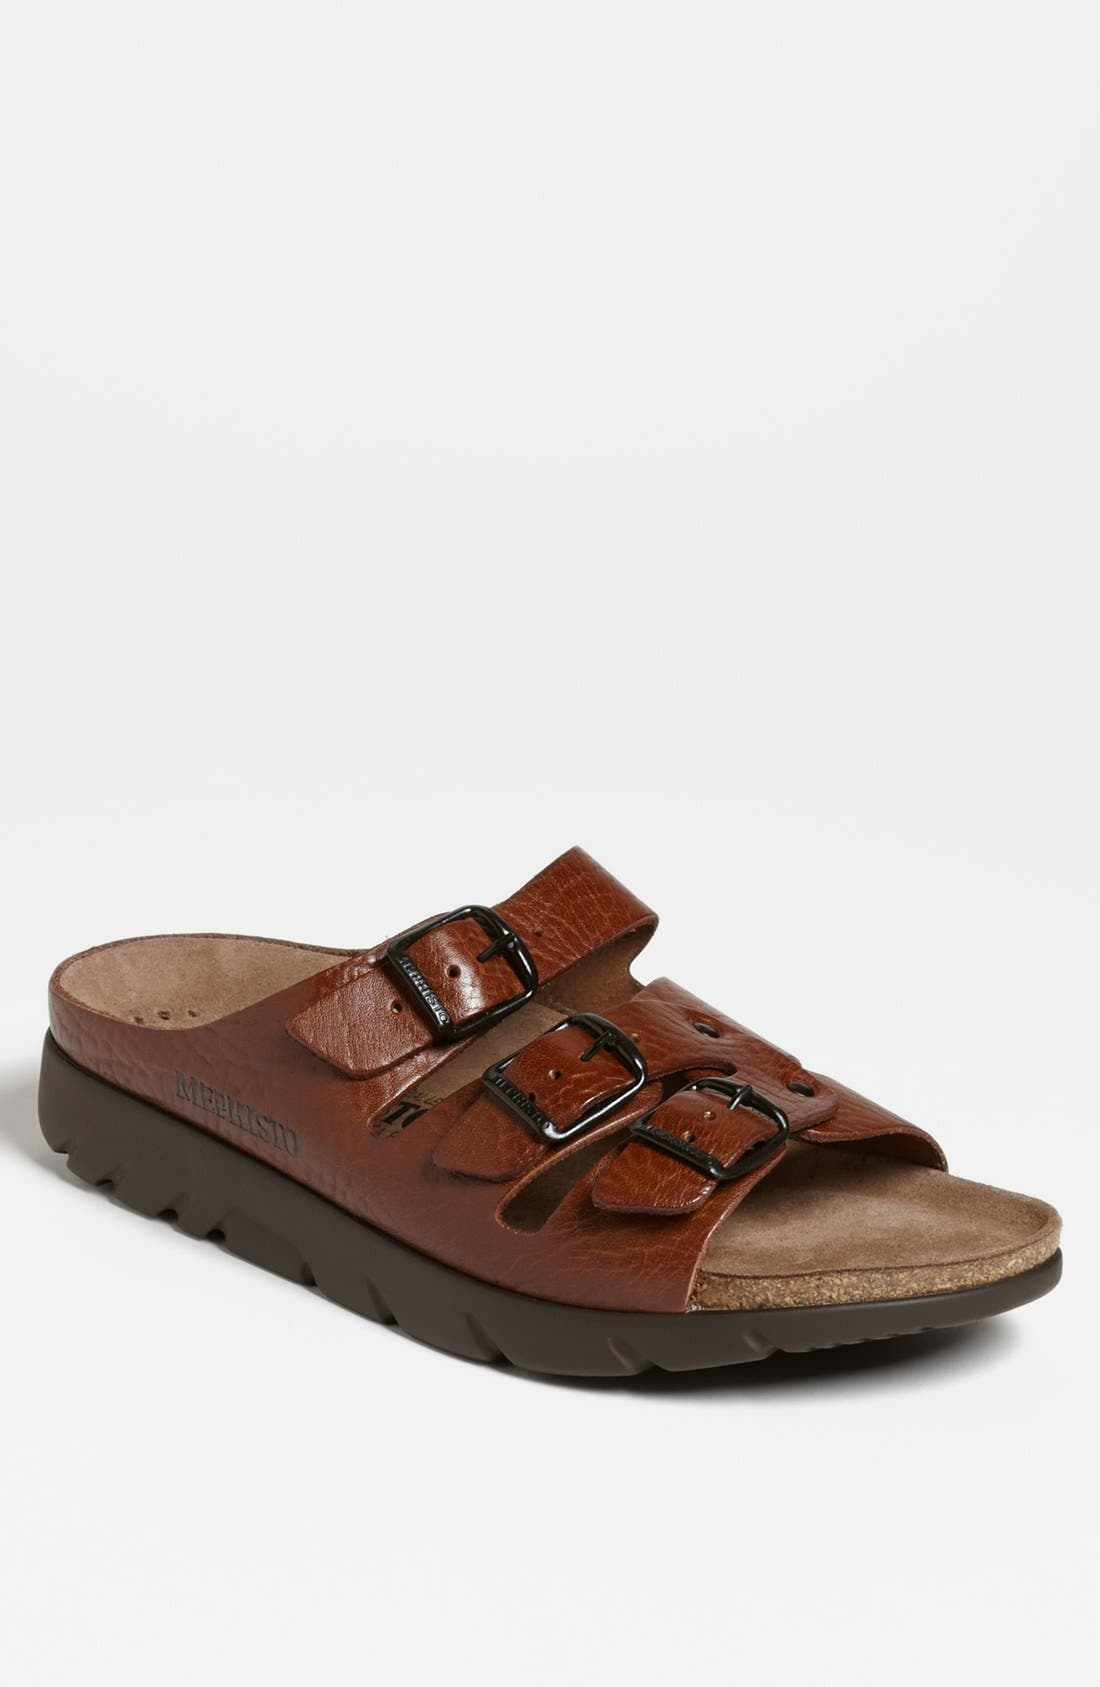 'Zach 3' Sandal,                             Main thumbnail 1, color,                             Tan Grain